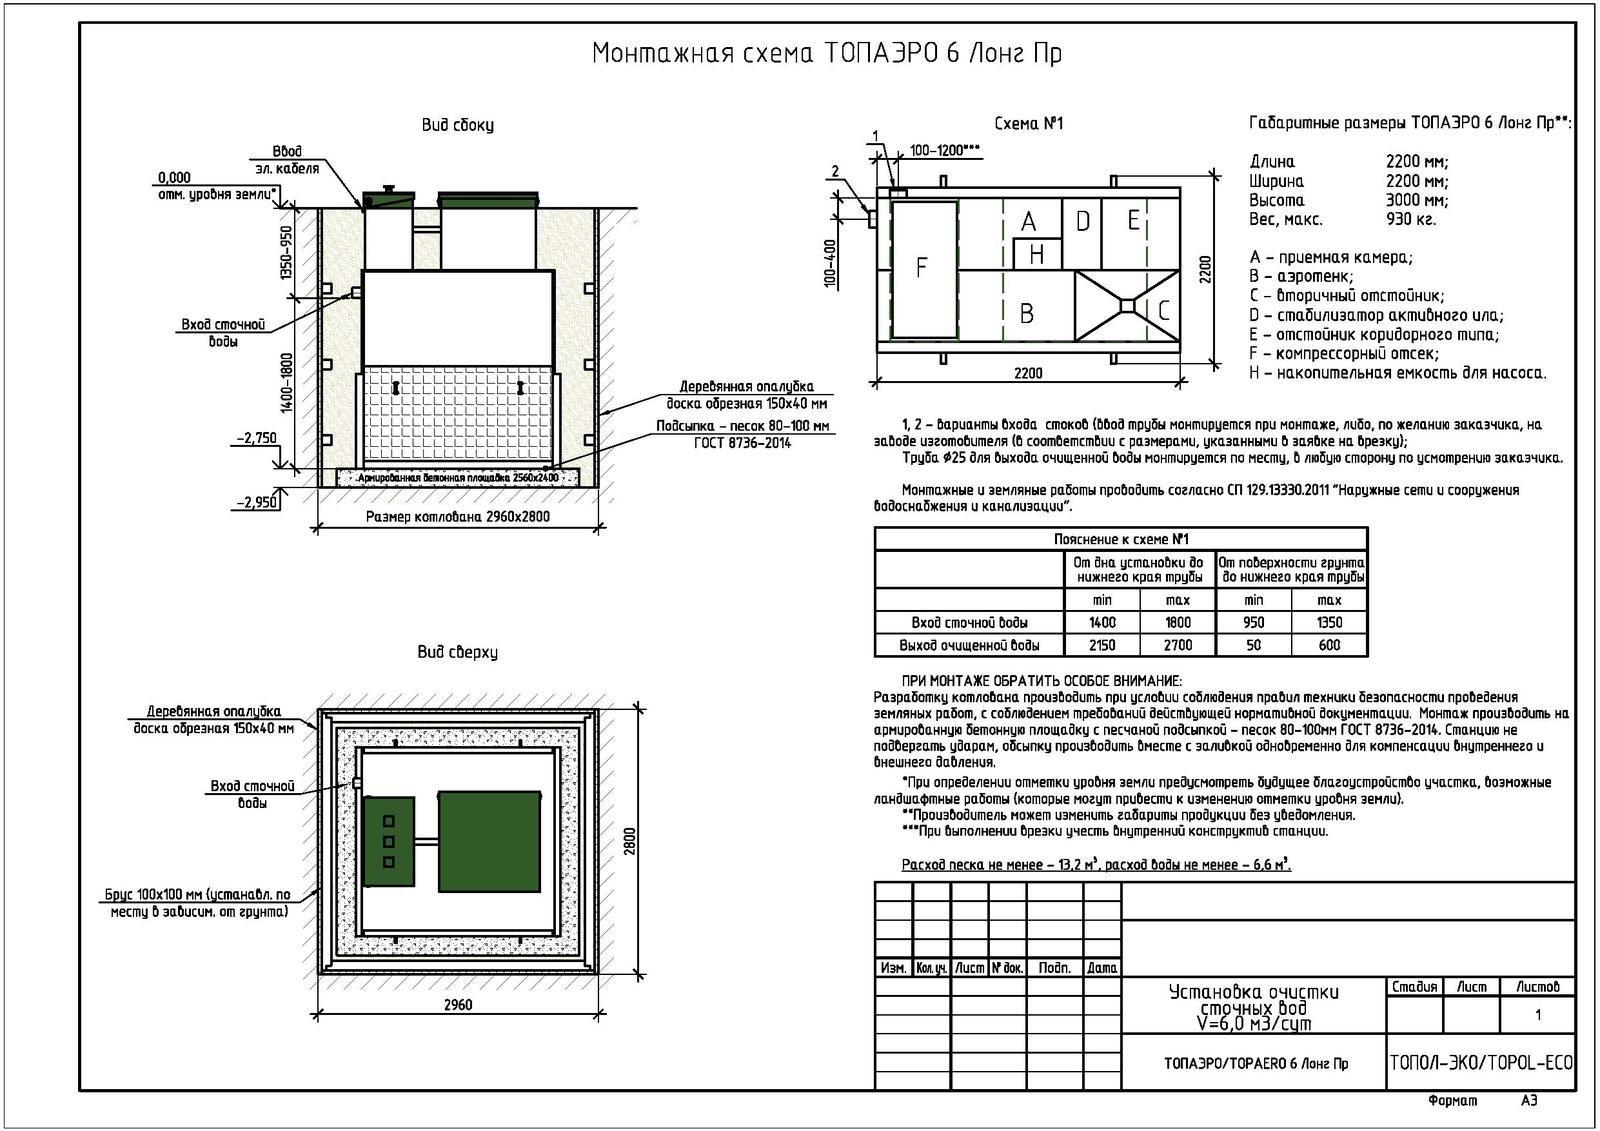 Монтажная схема септика Топаэро 6 Лонг ПР